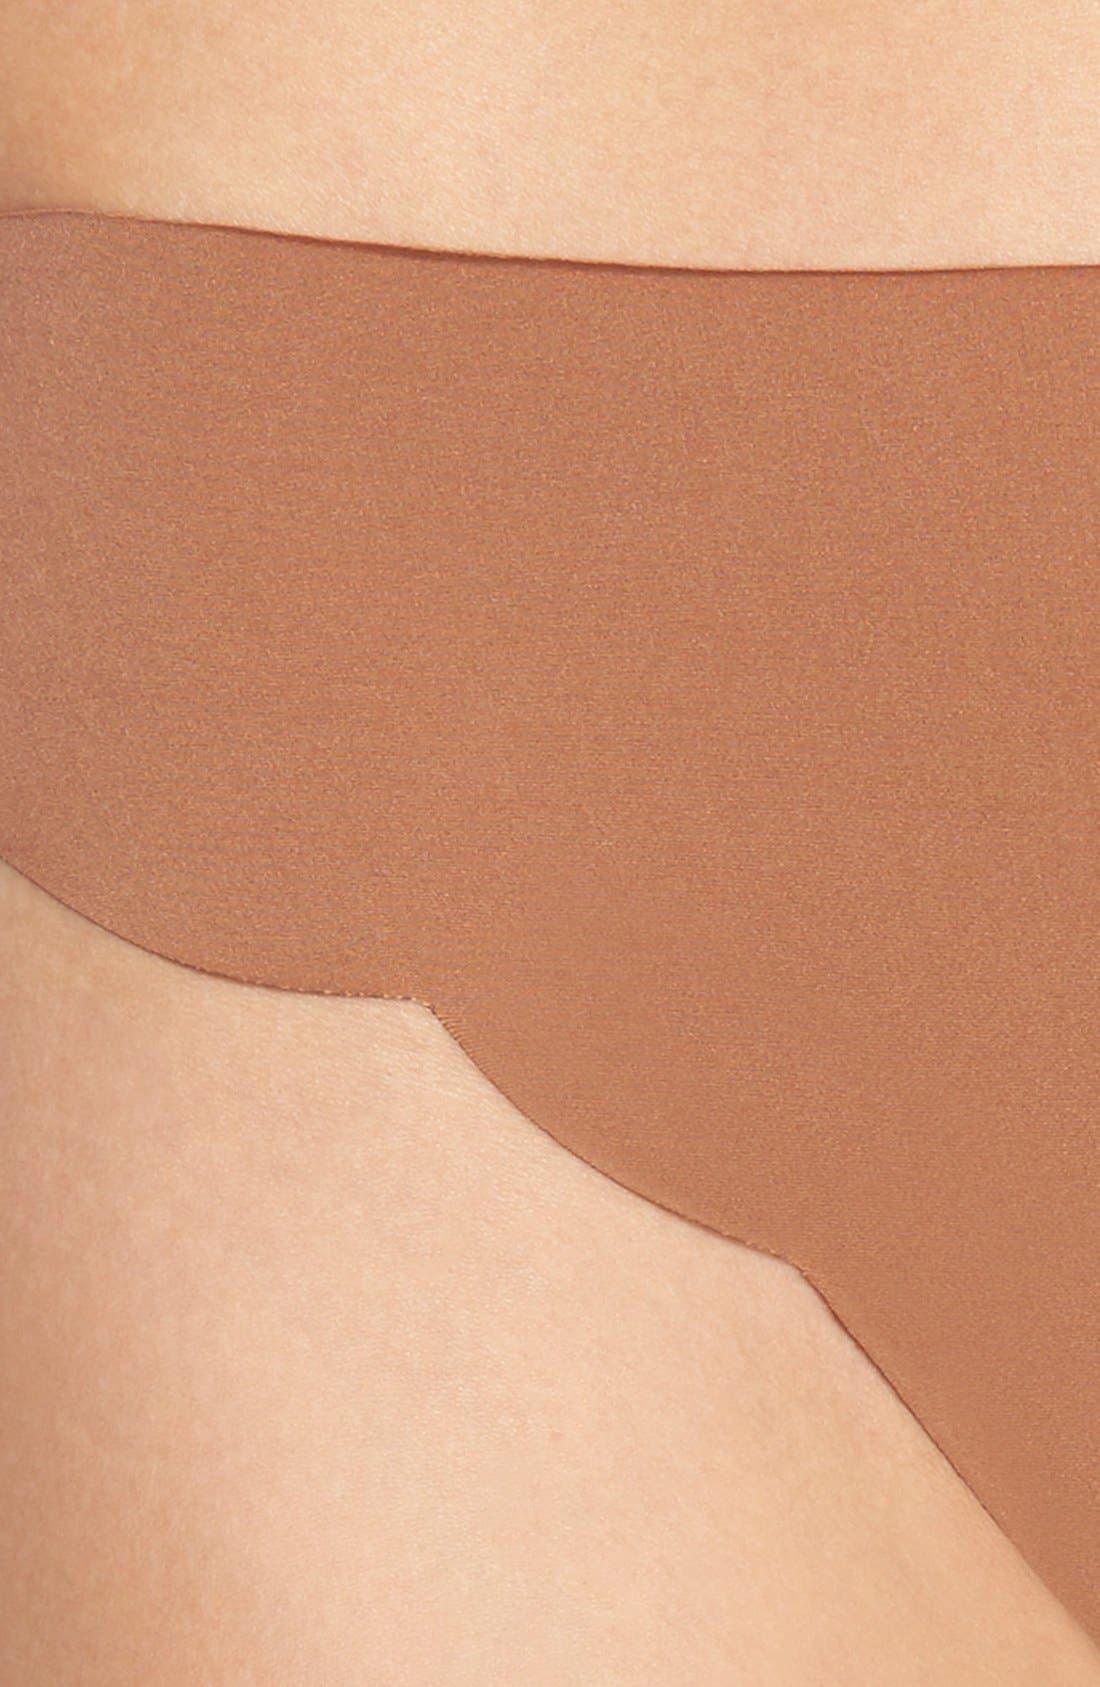 'No Show' Scalloped Thong,                             Alternate thumbnail 2, color,                             243